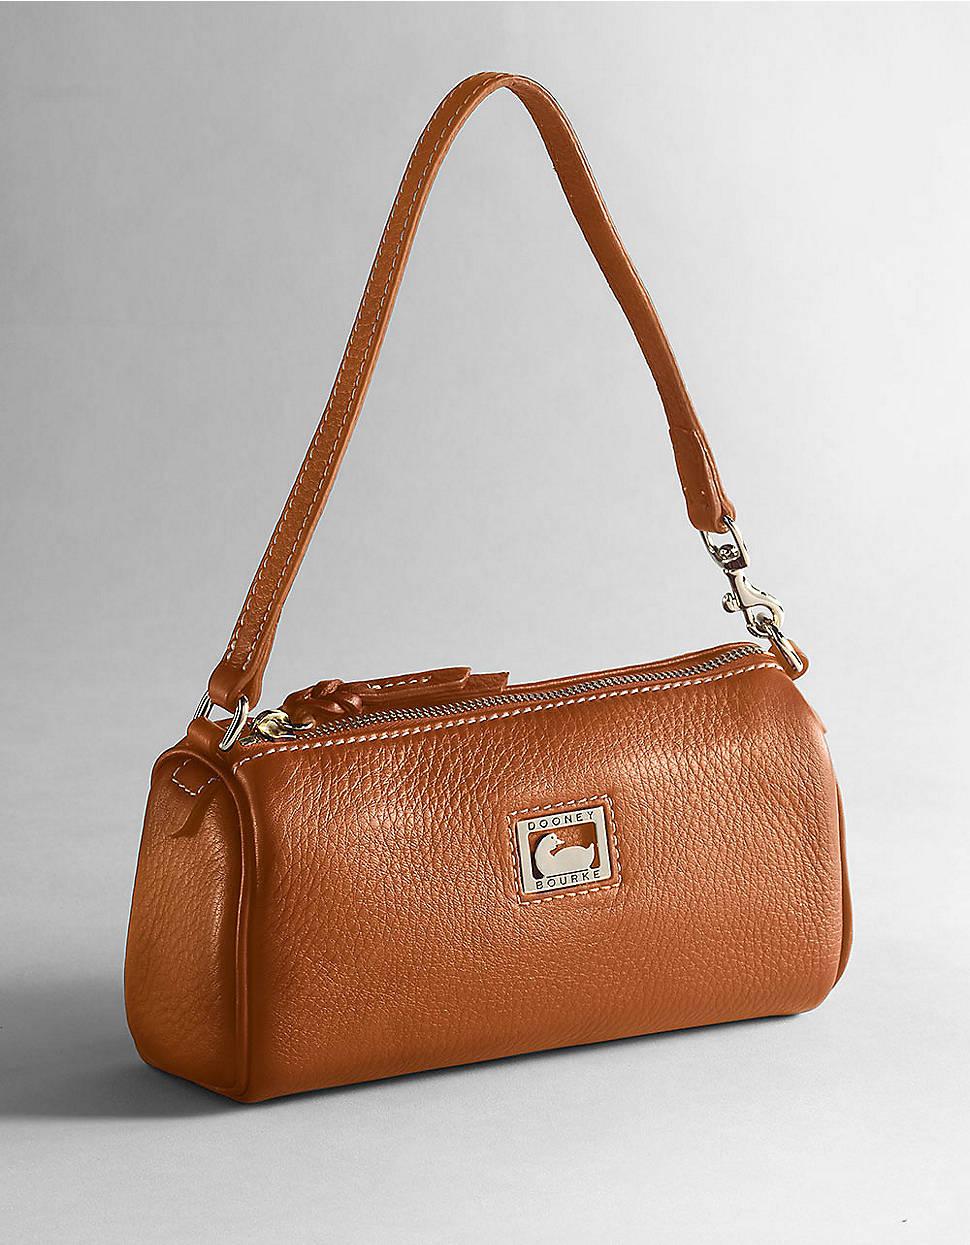 Dooney & Bourke Leather Mini barrel Handbag in Desert (Brown) - Lyst